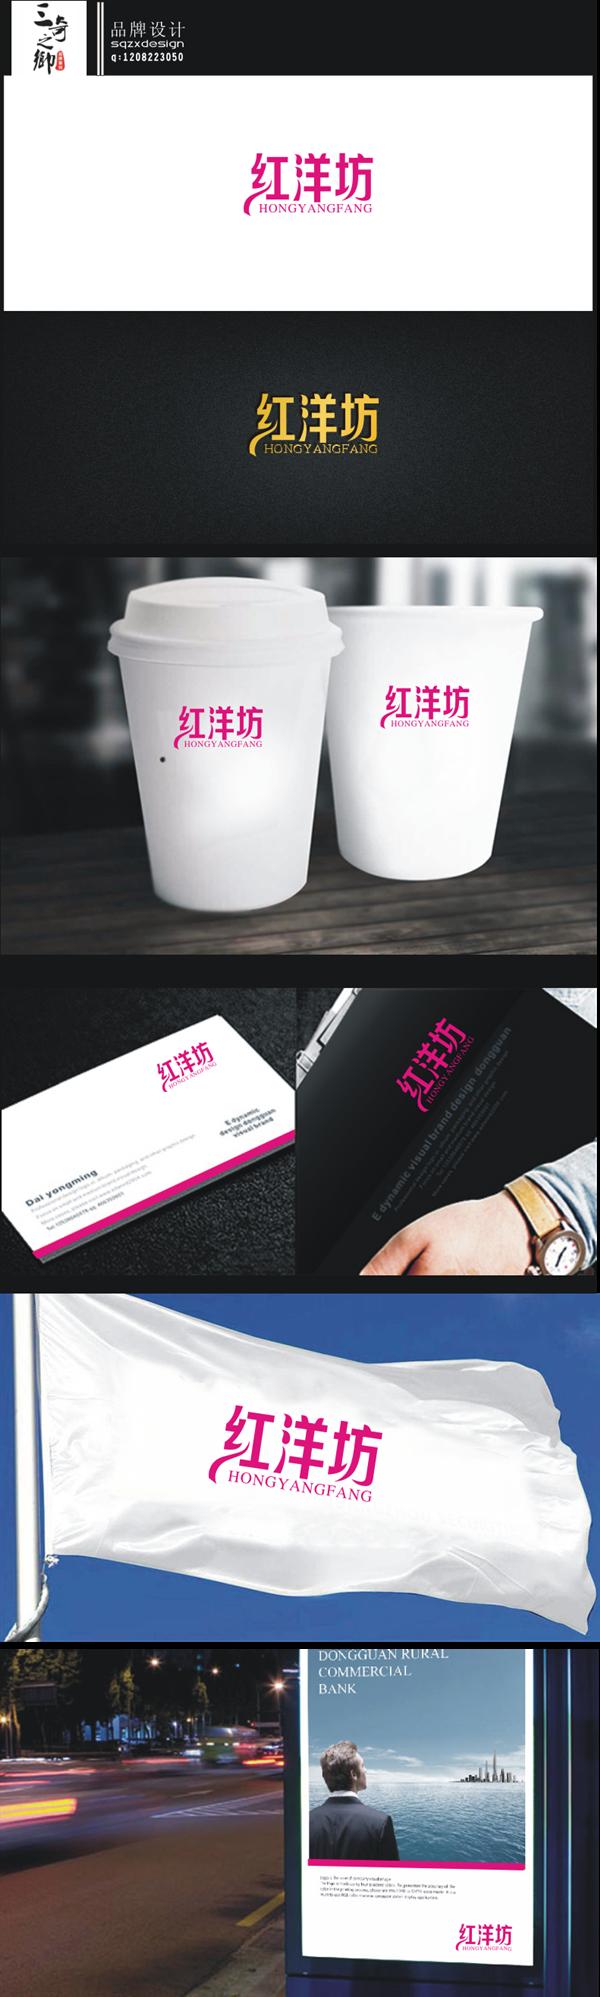 aads05 Skin Lightening Products Chinese Logo design cosmetics logo